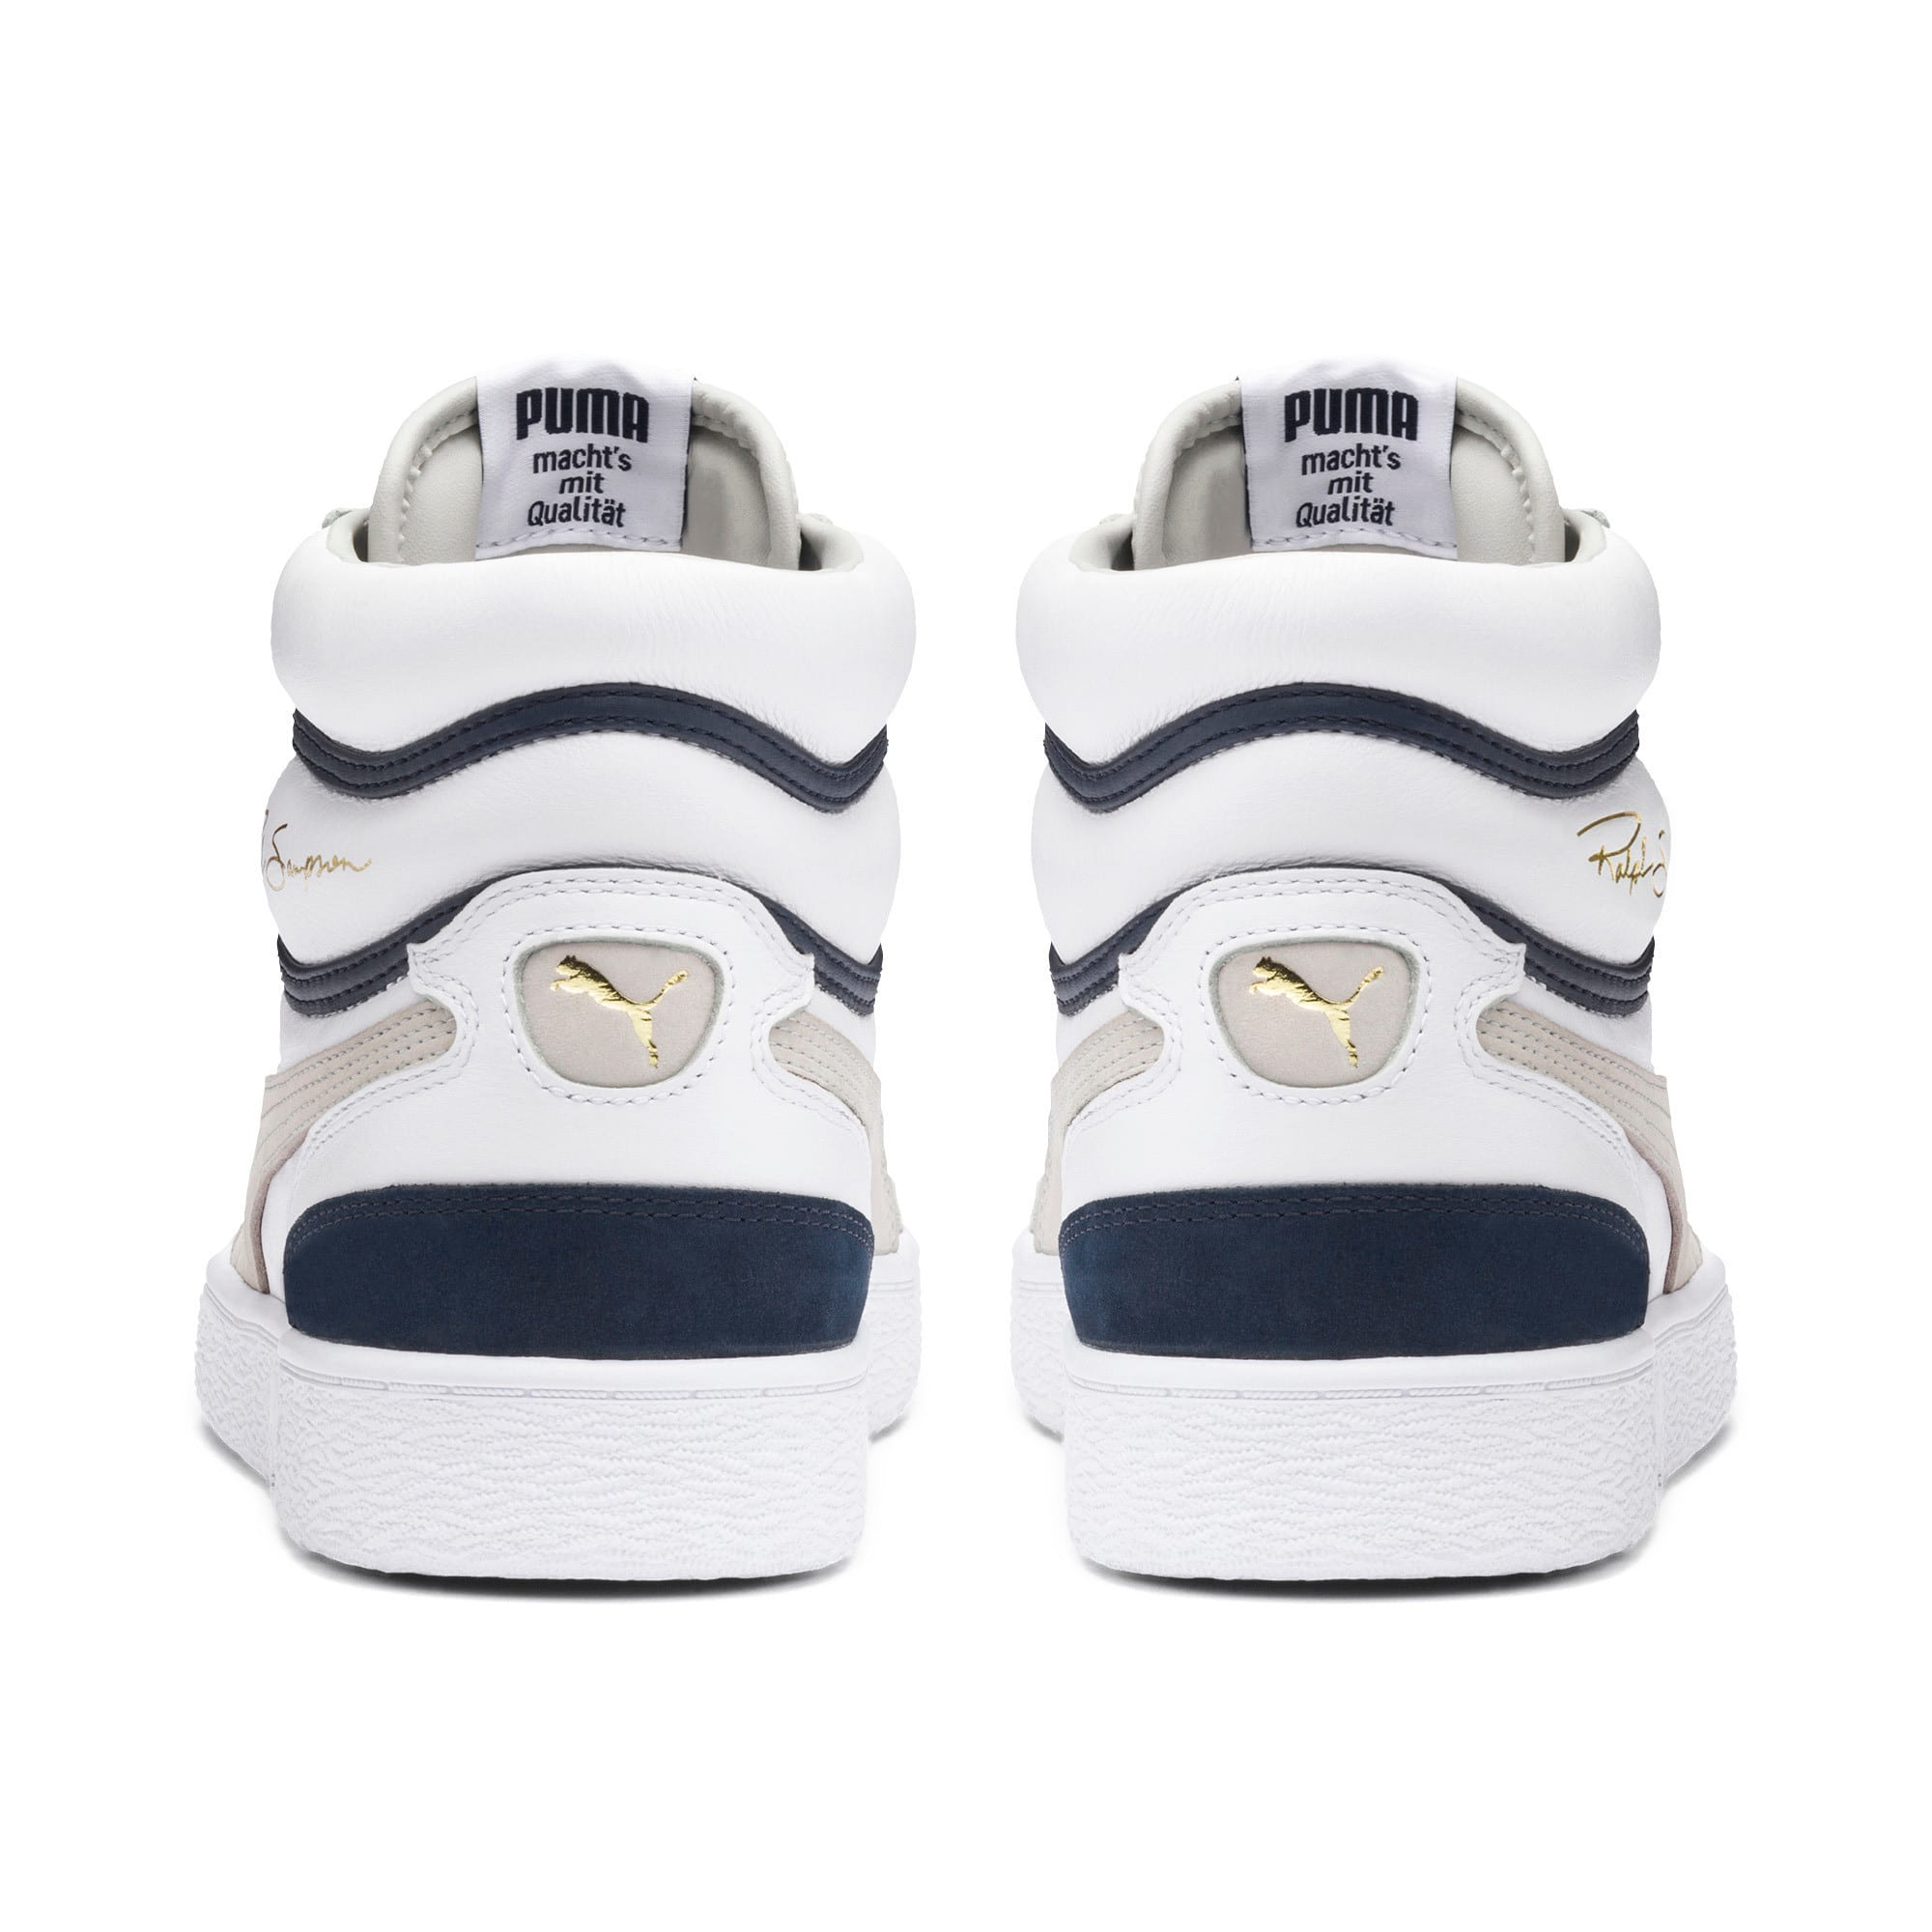 Thumbnail 3 of Ralph Sampson Mid OG Sneakers, Puma Wht-Gray Violet-Peacoat, medium